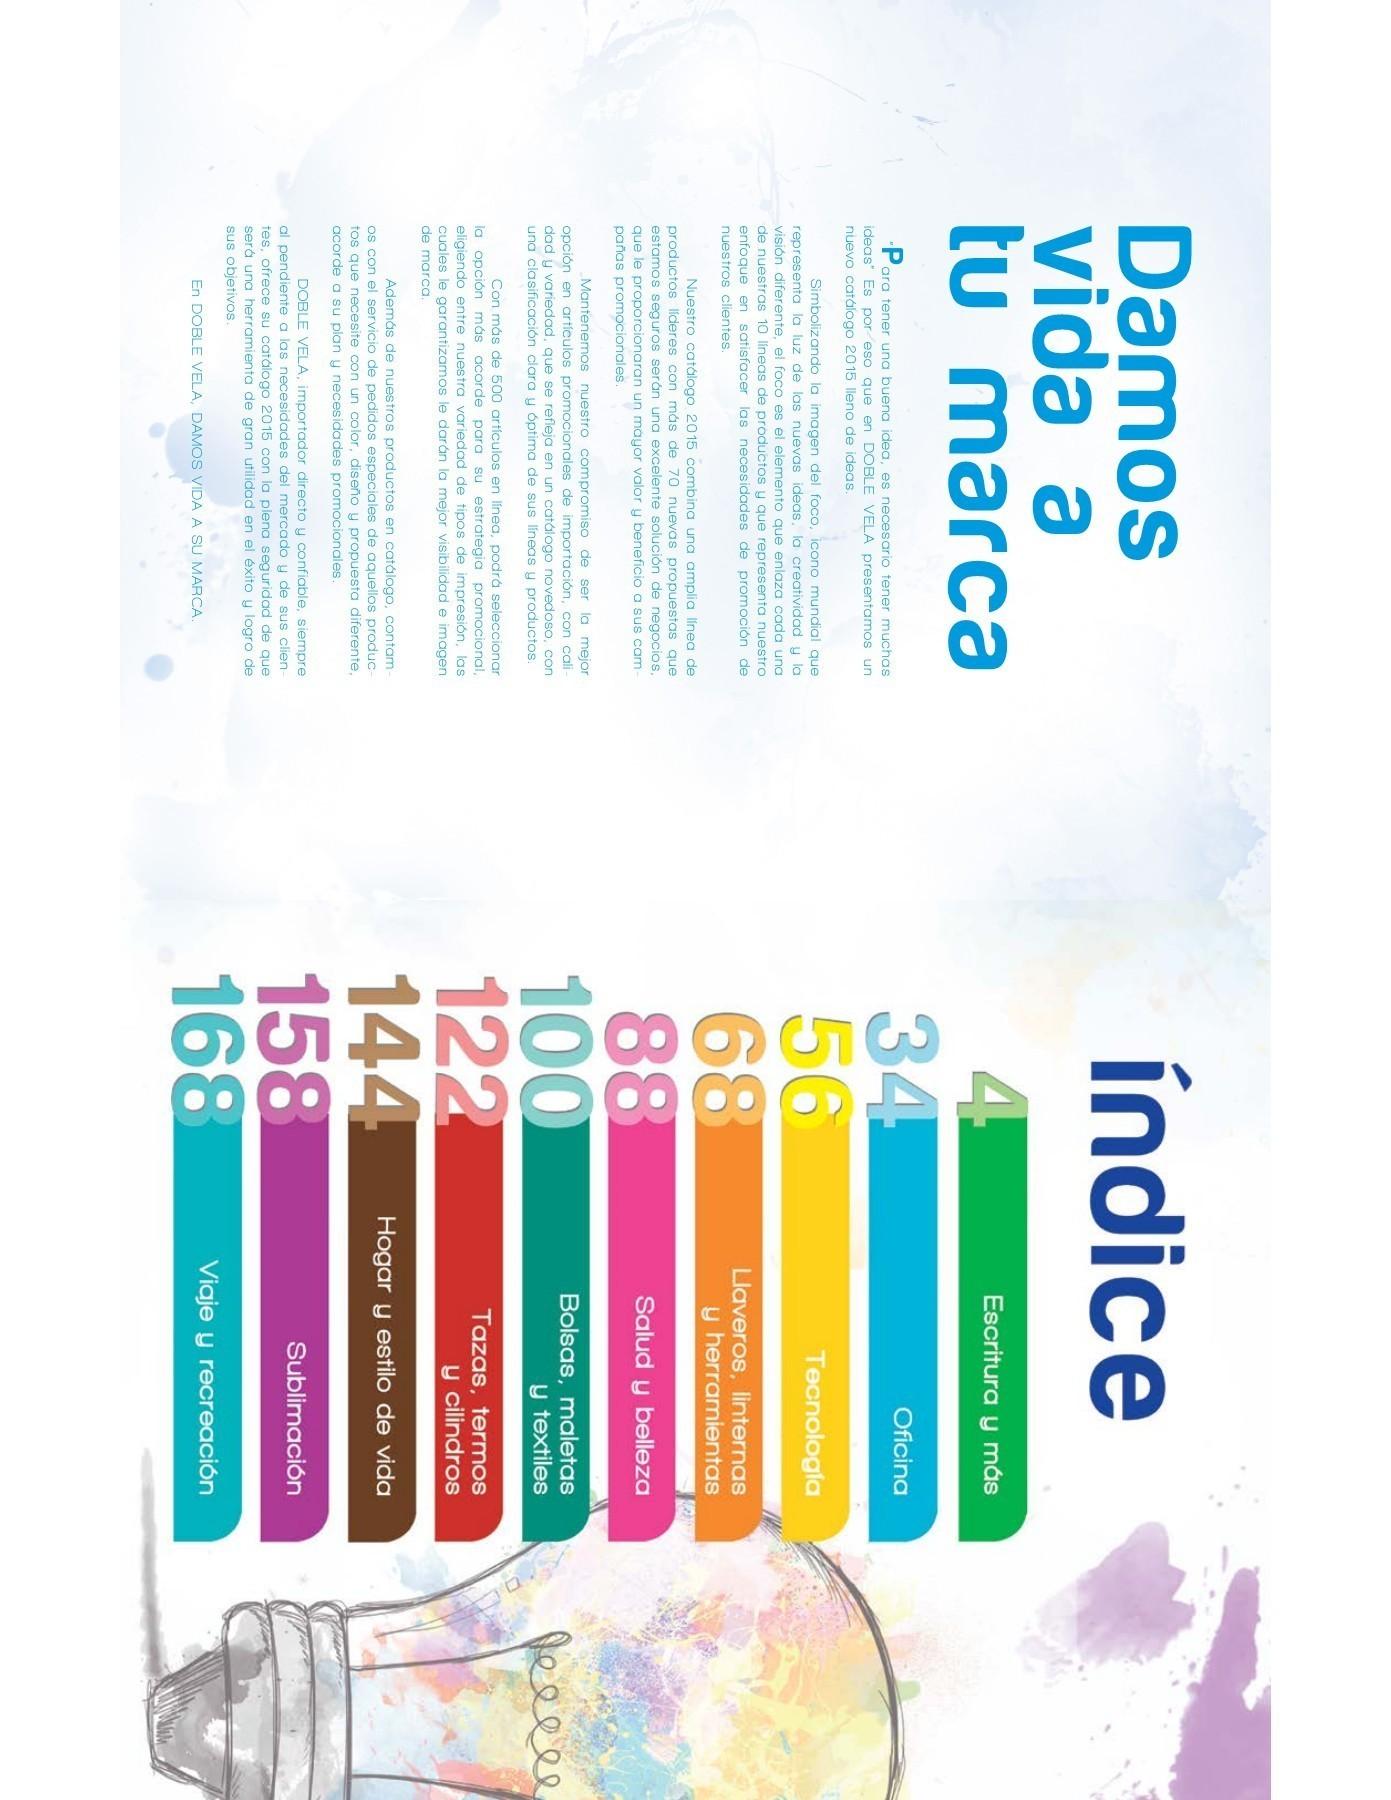 2 Catálogo DobleVela Pages 1 50 Text Version derecho calendario 2019 feriados colombia